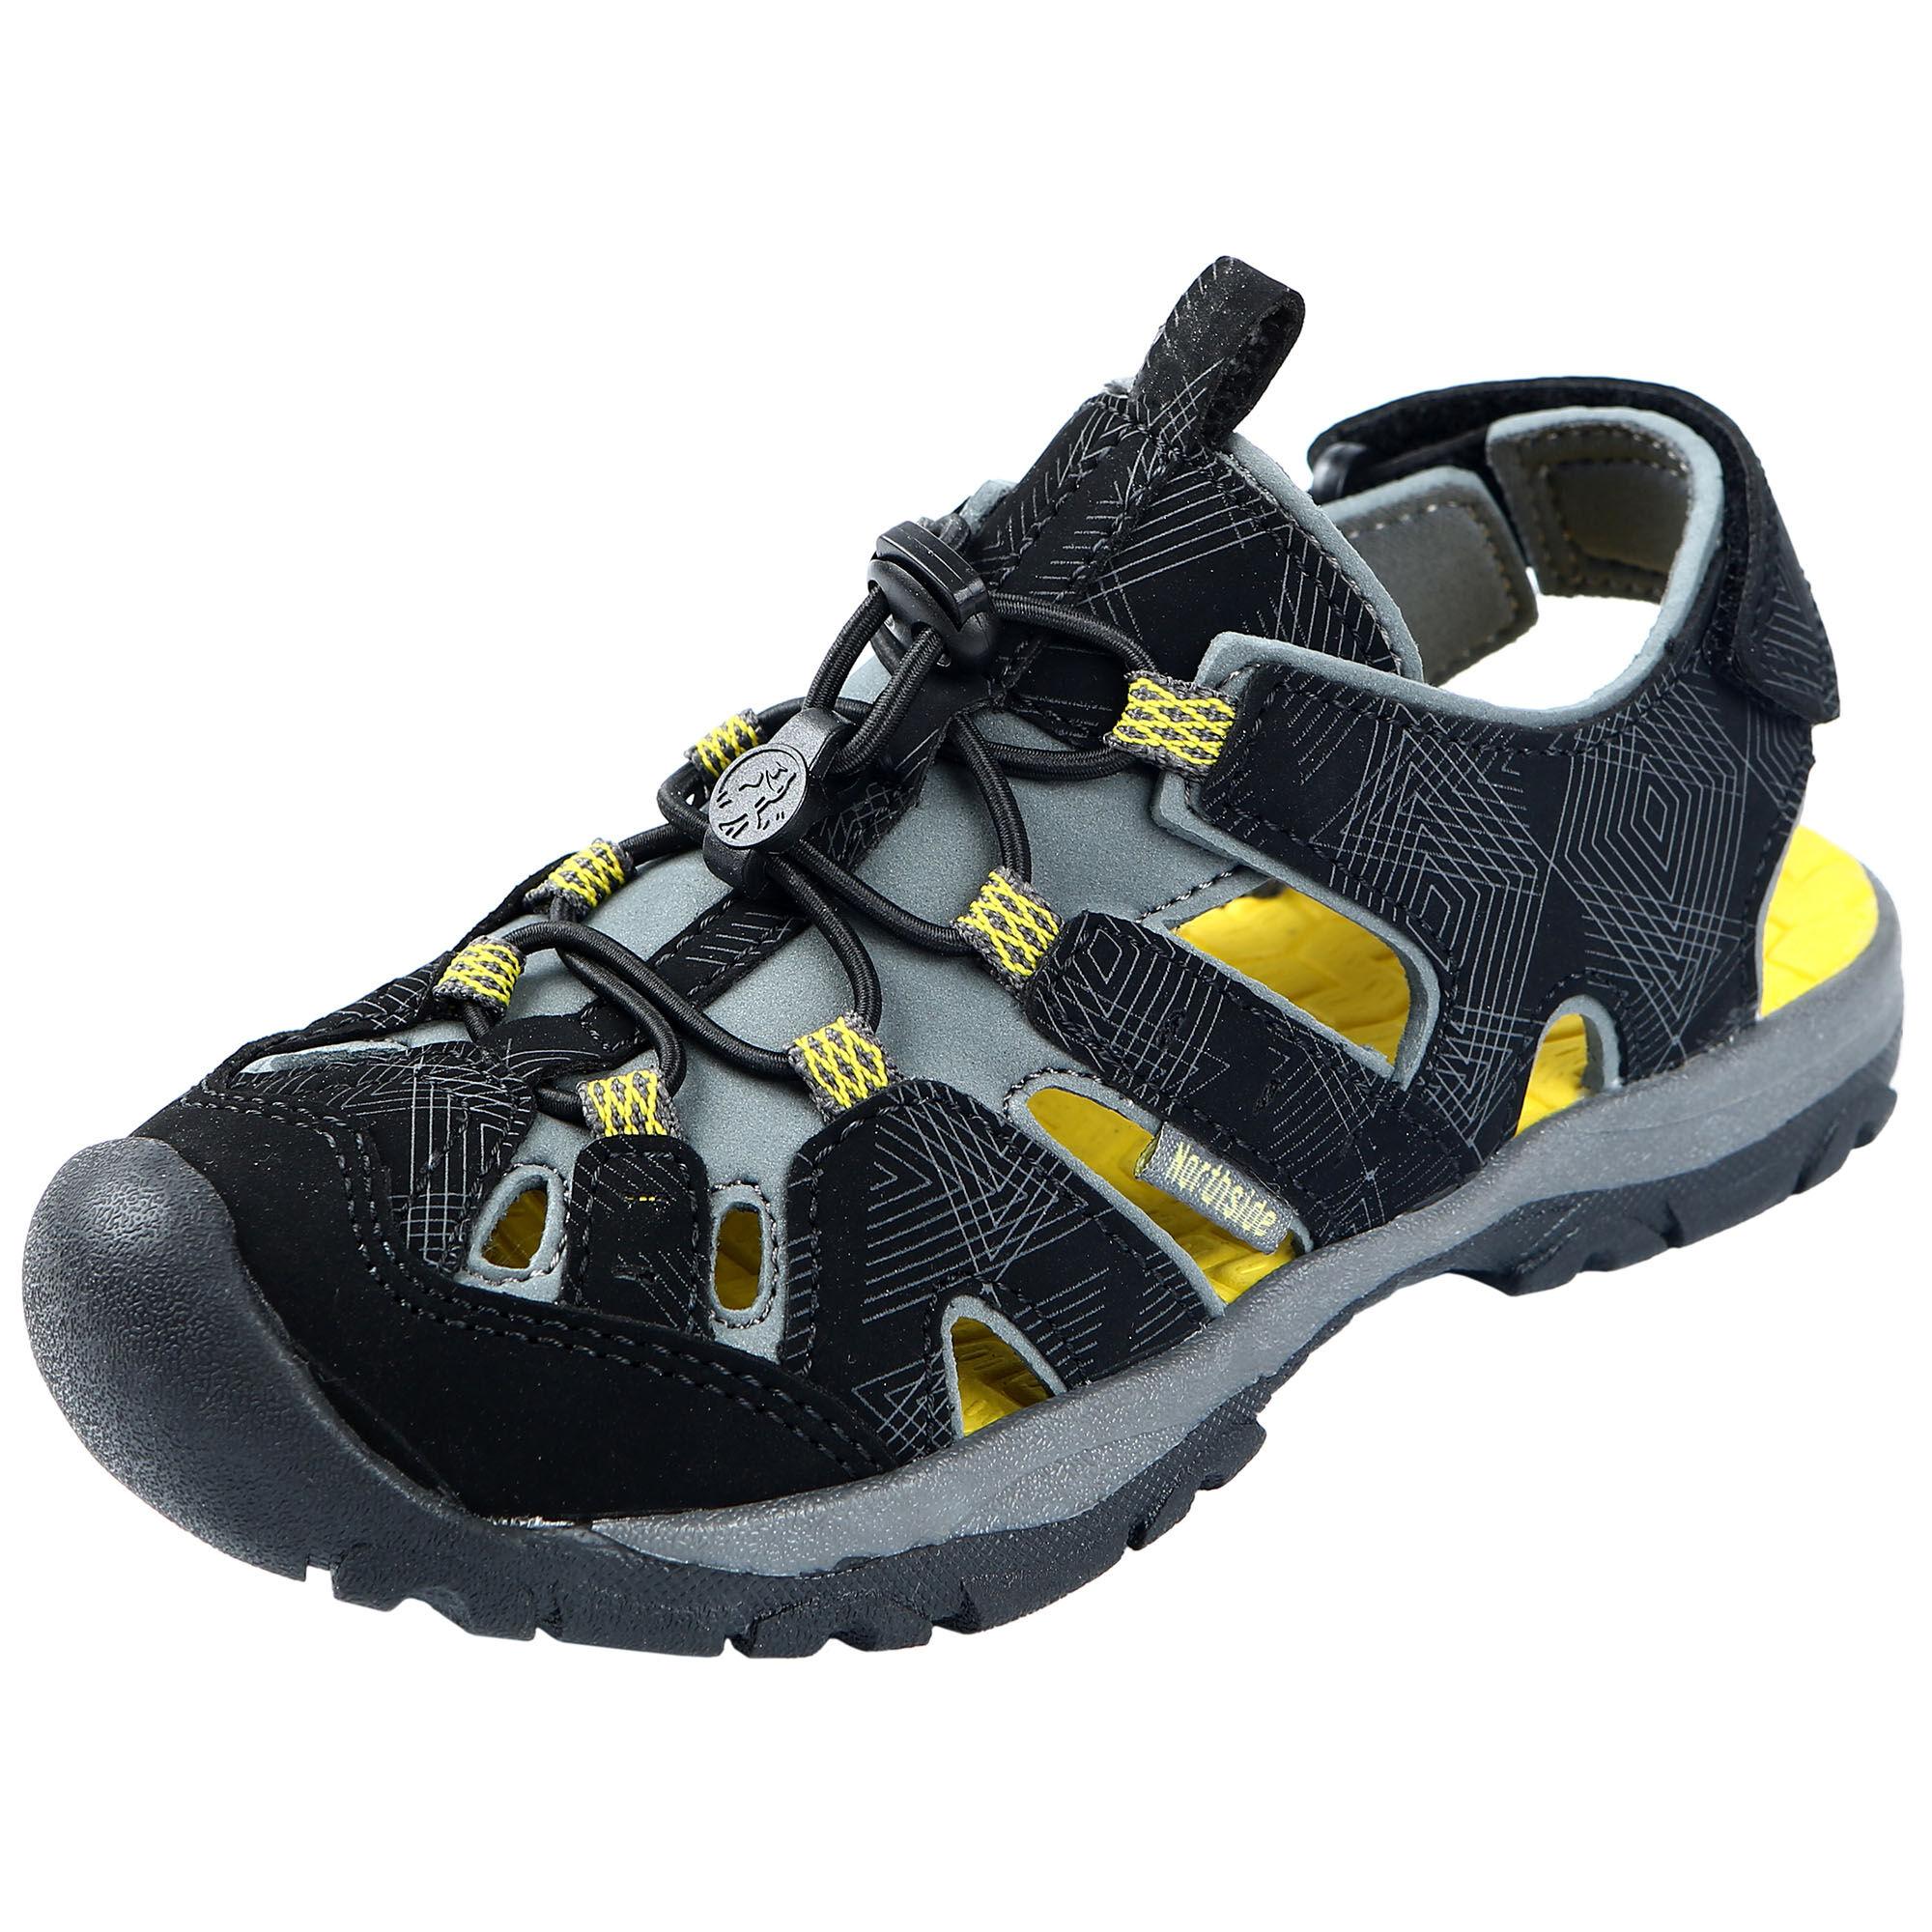 Northside Boy's Burke SE Sport Sandals  - Black/Yellow - Size: 2